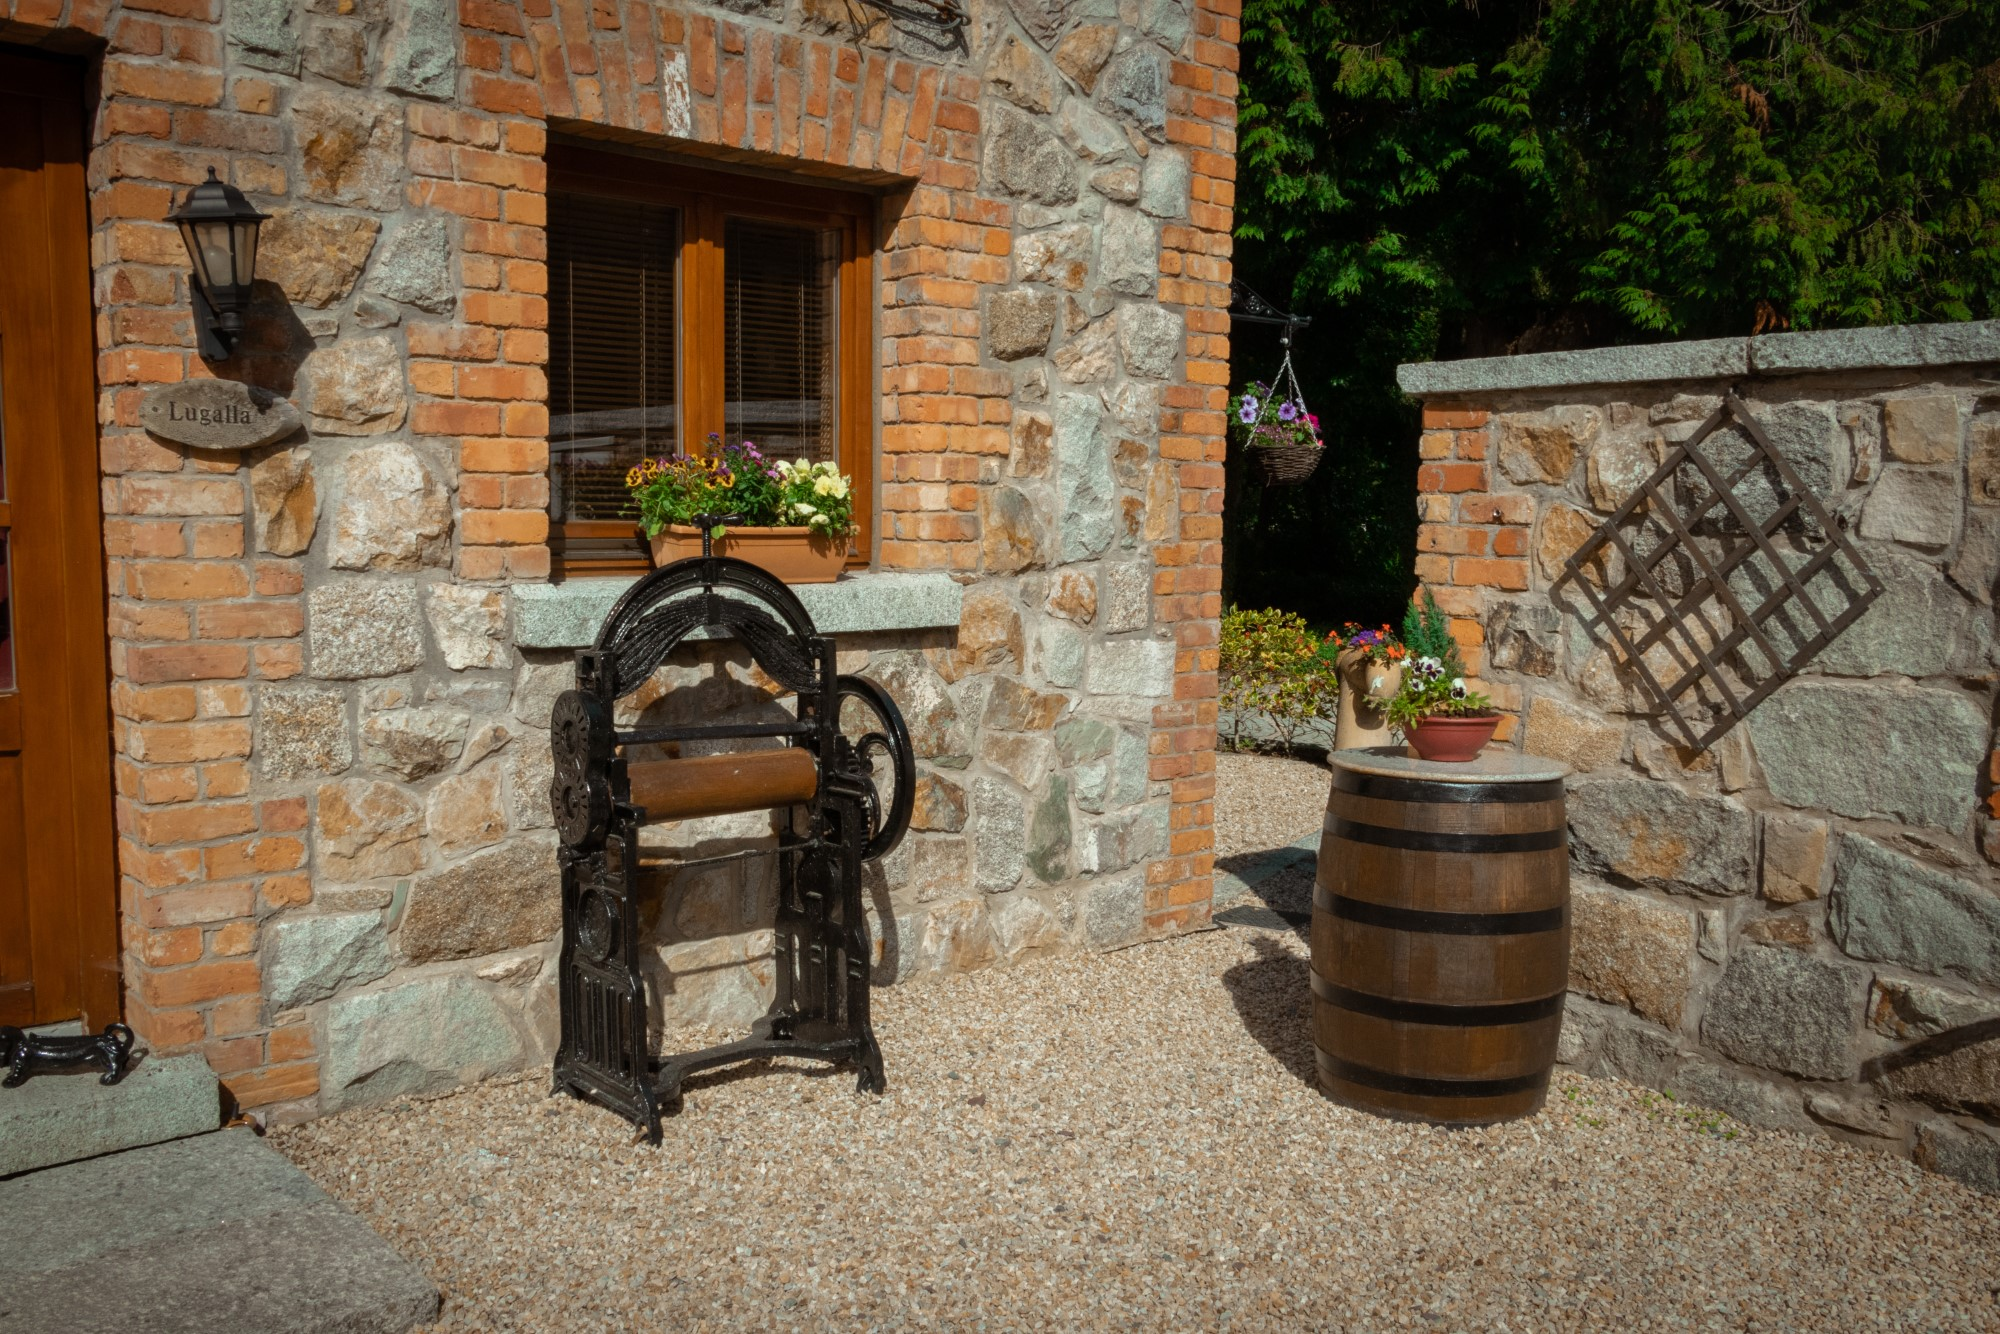 Lugala House - Outside 1 - Croneybyrne Courtyard